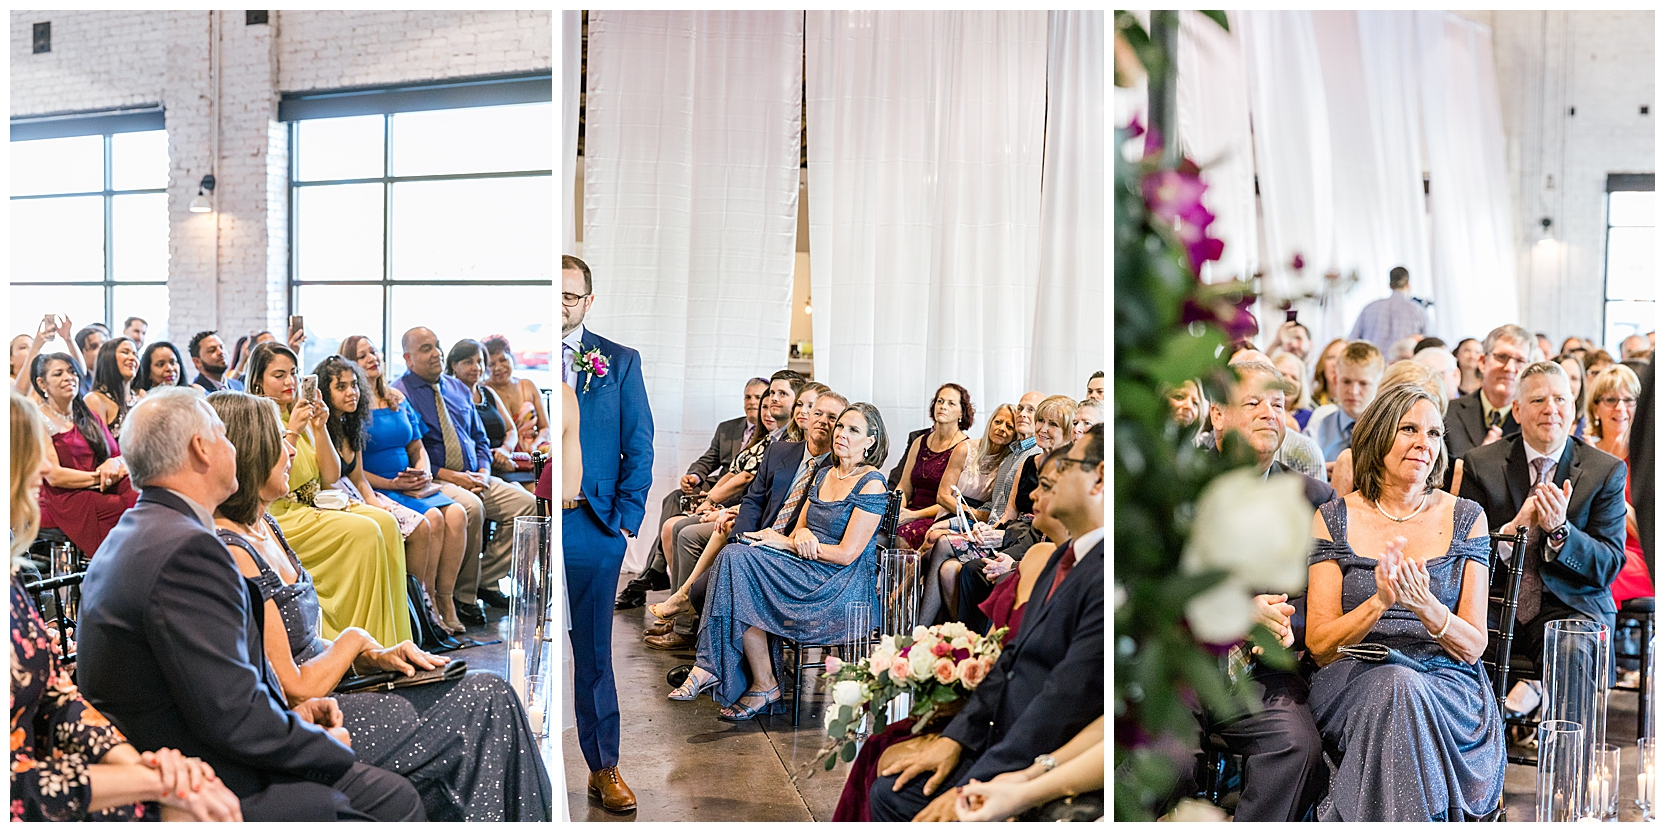 jessicafredericks_lakeland_tampa_wedding_purple_crazy hour_0047.jpg